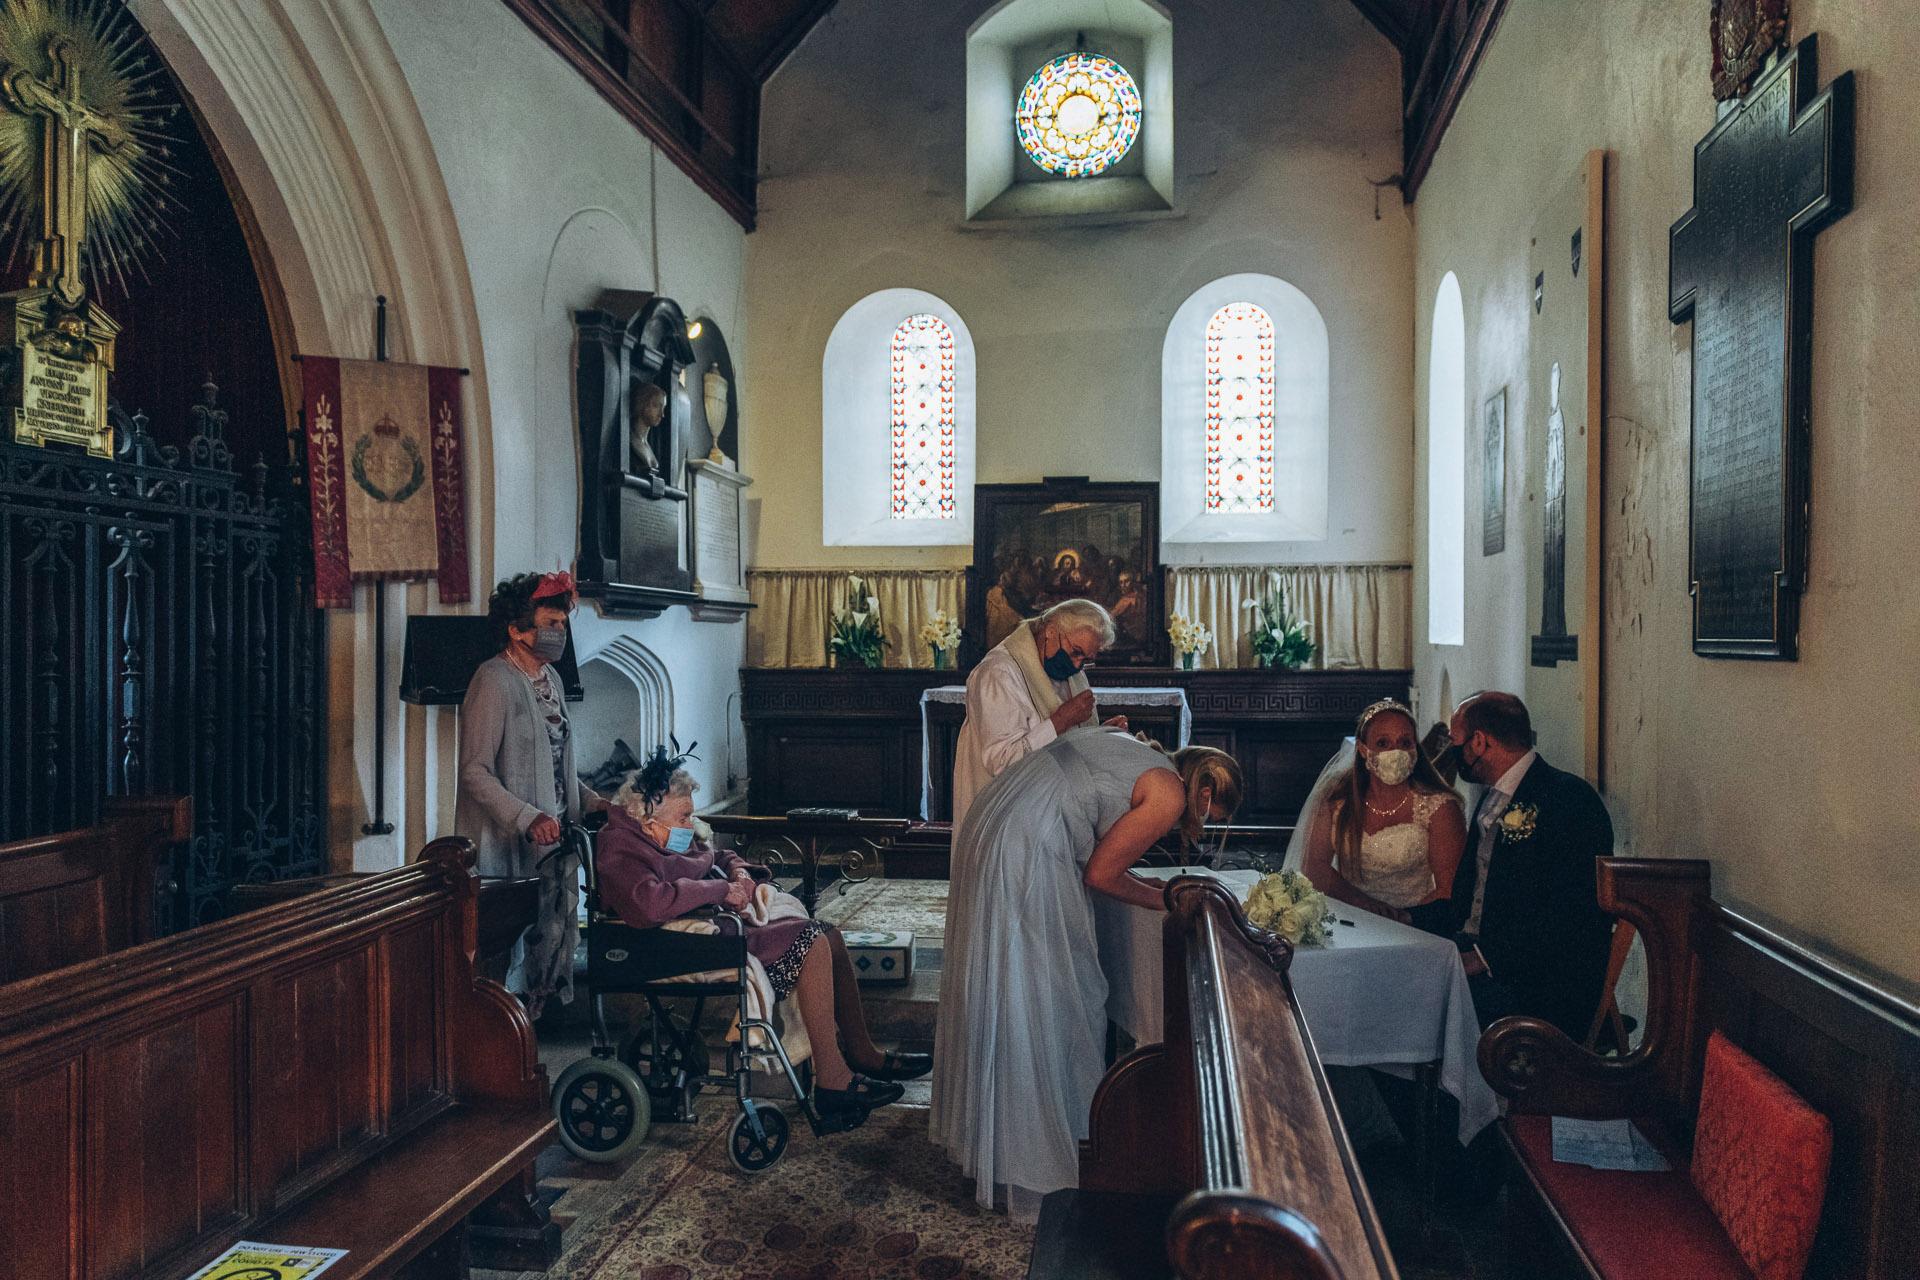 32 Small weddings Hertfordshire